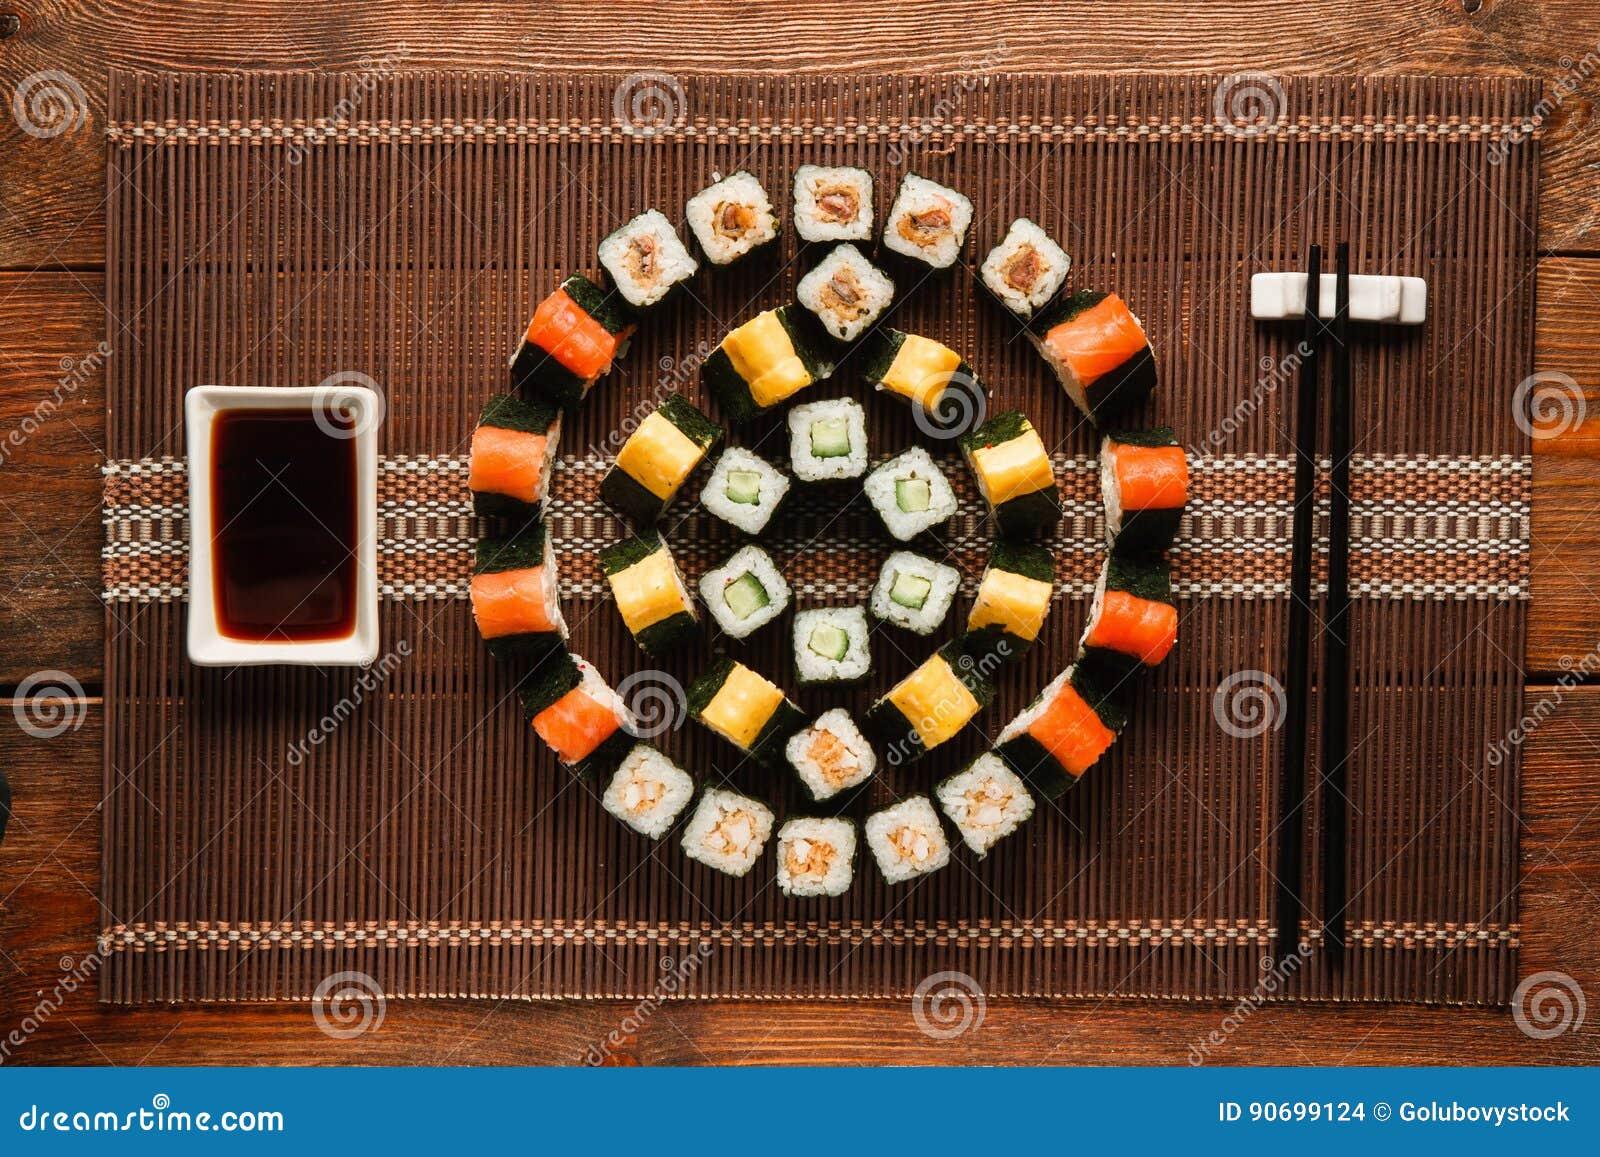 Food Art Colorful Ornament Of Sushi Flat Lay Stock Photo Image Of Bright Nori 90699124